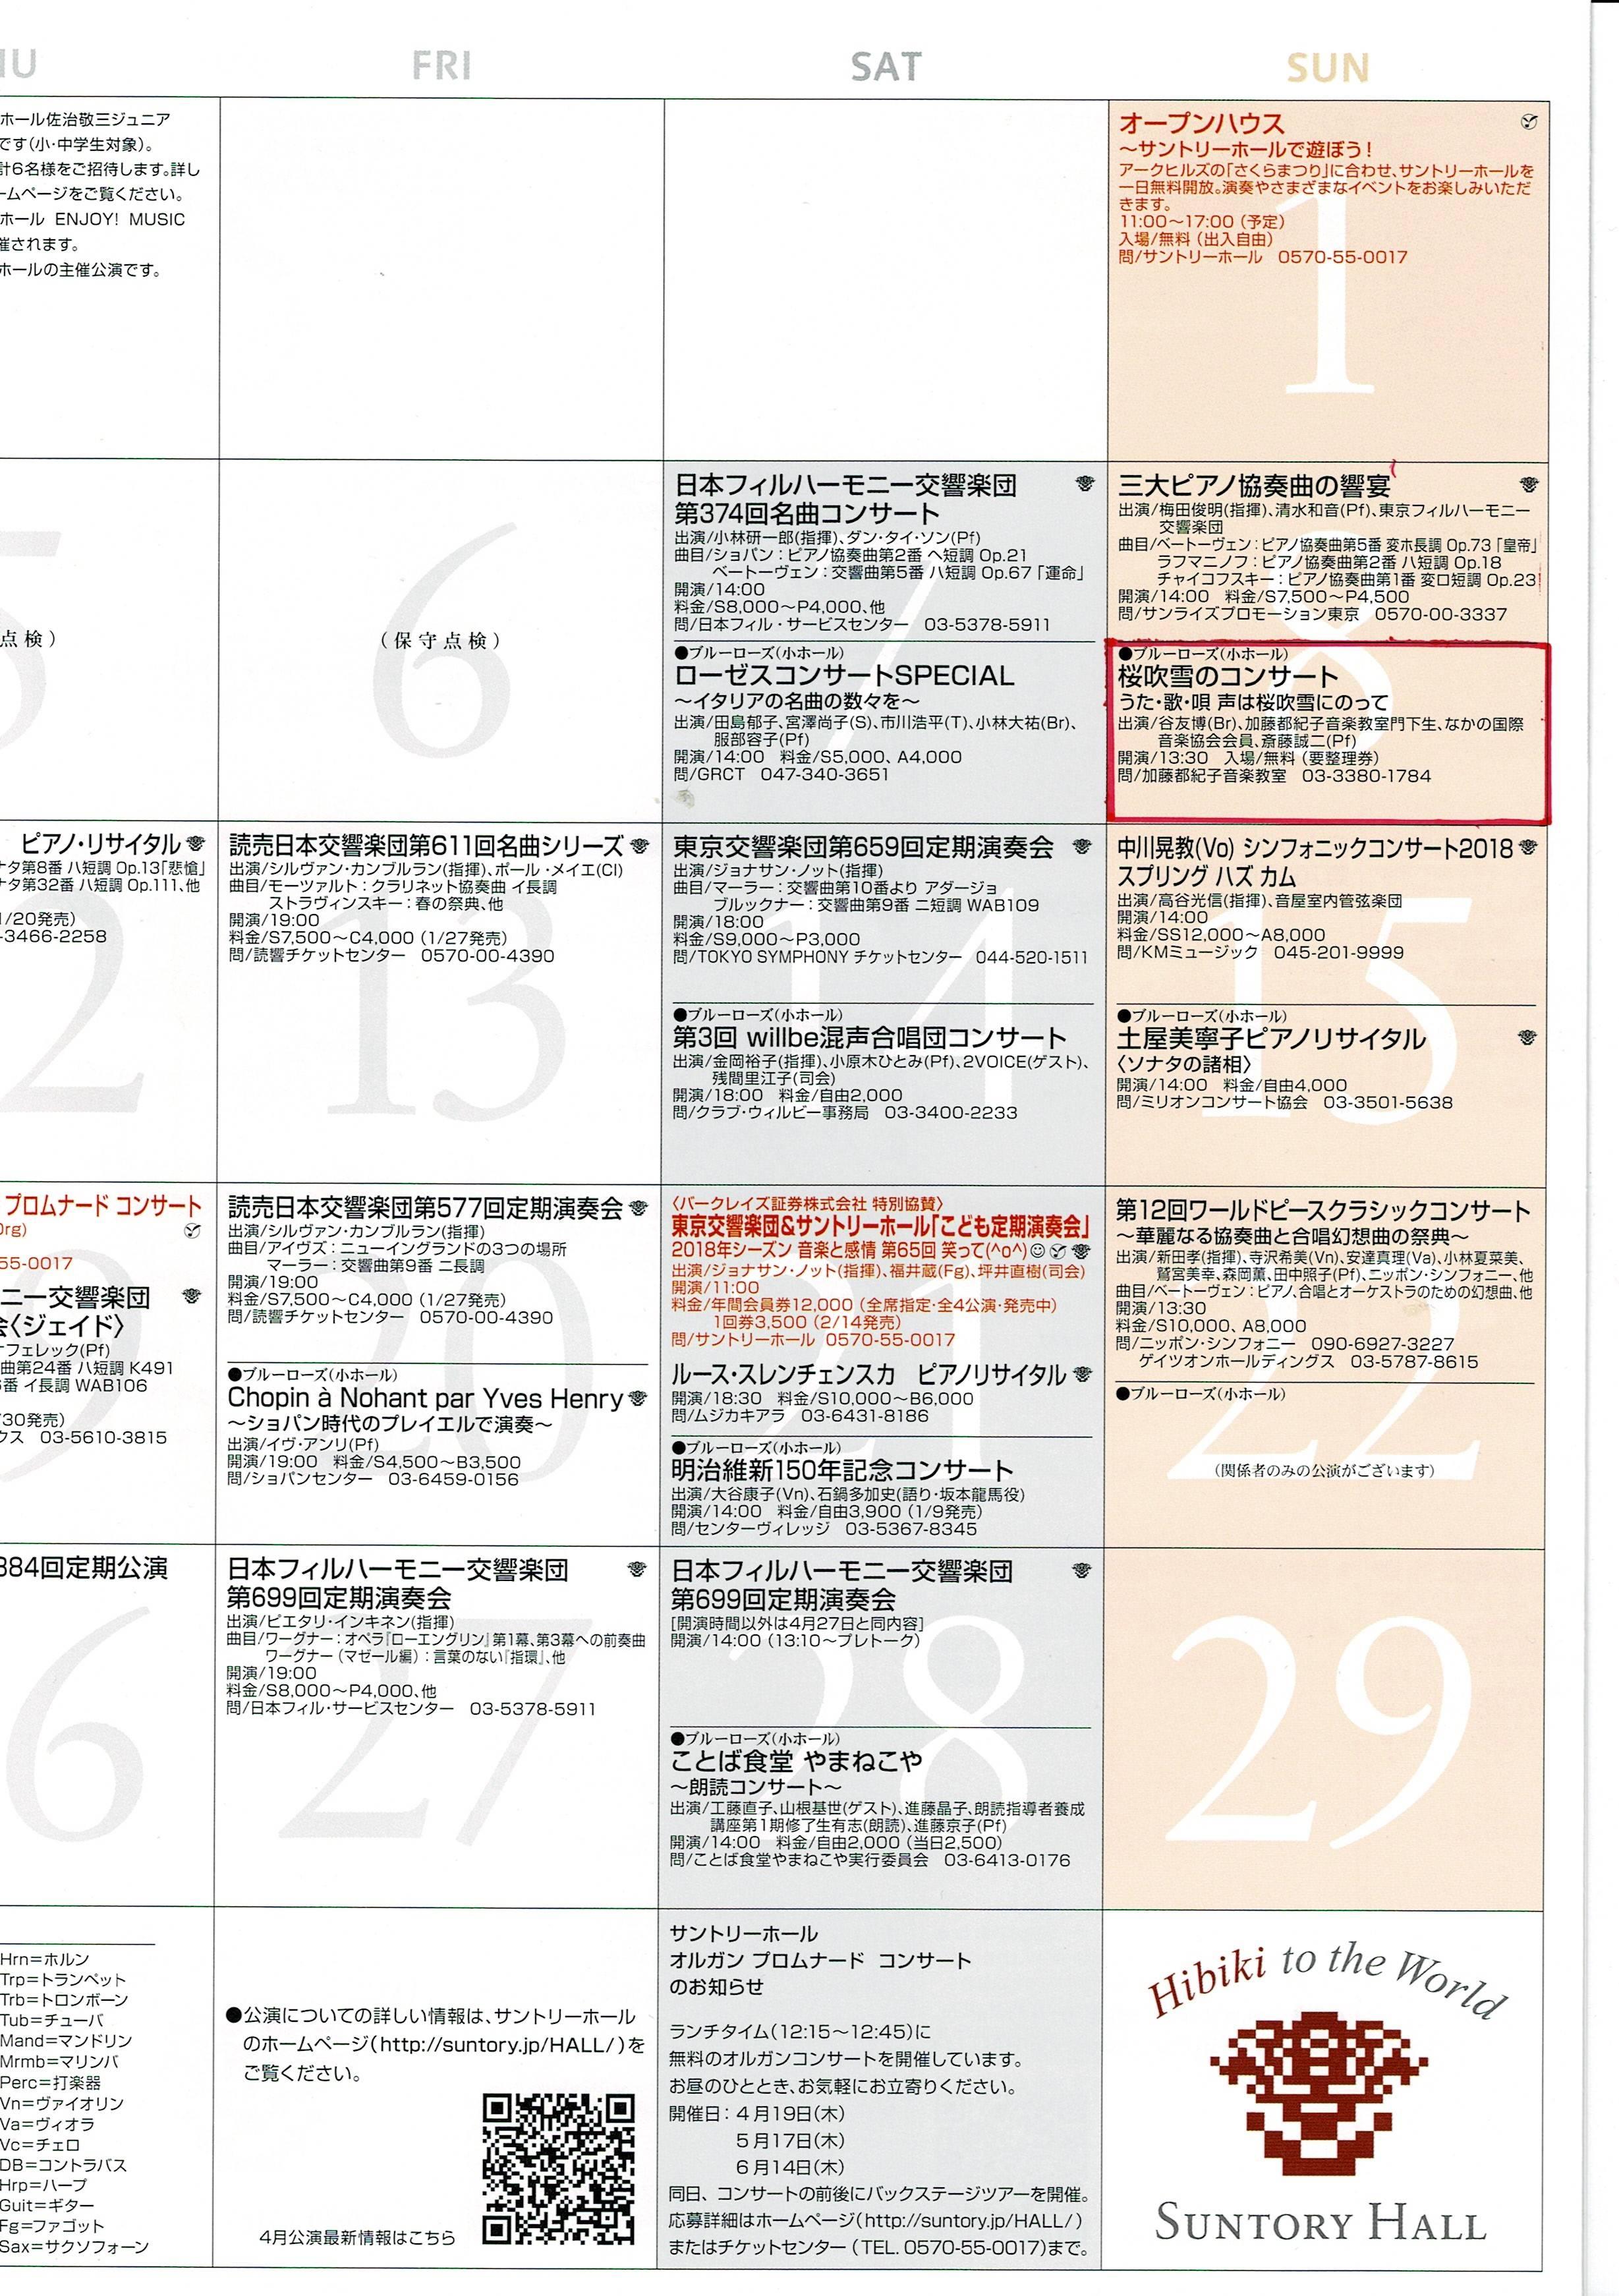 http://tokiko.fine.to/Scan2018-01-11_210512_001.jpg